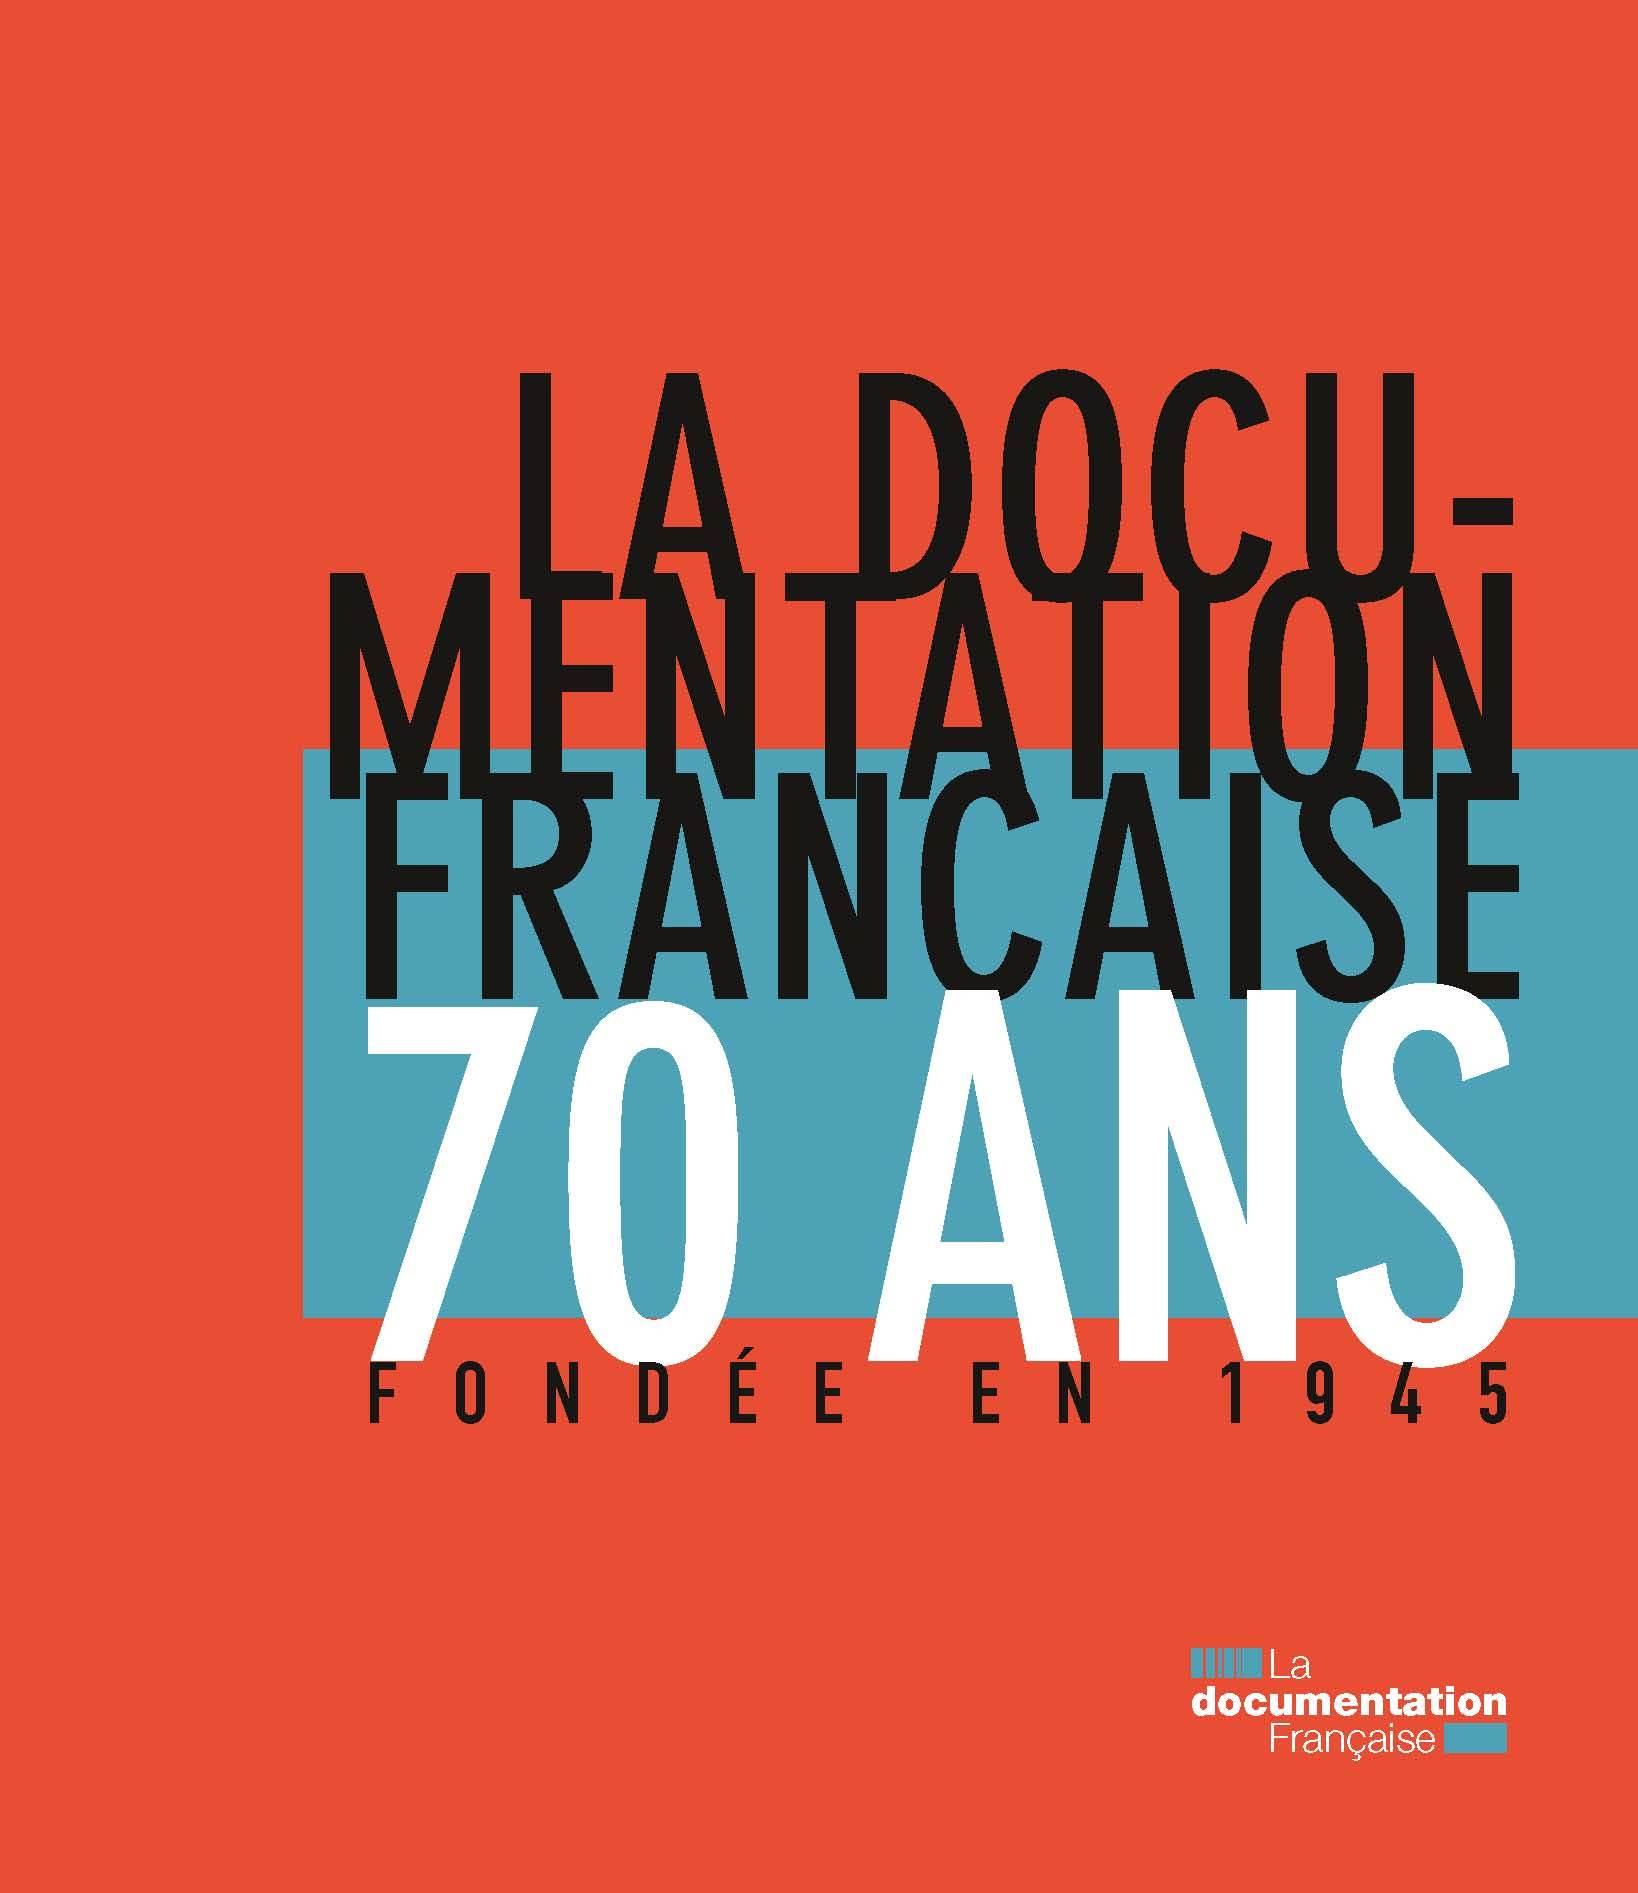 LA DOCUMENTATION FRANCAISE 70 ANS - FONDEE EN 1945